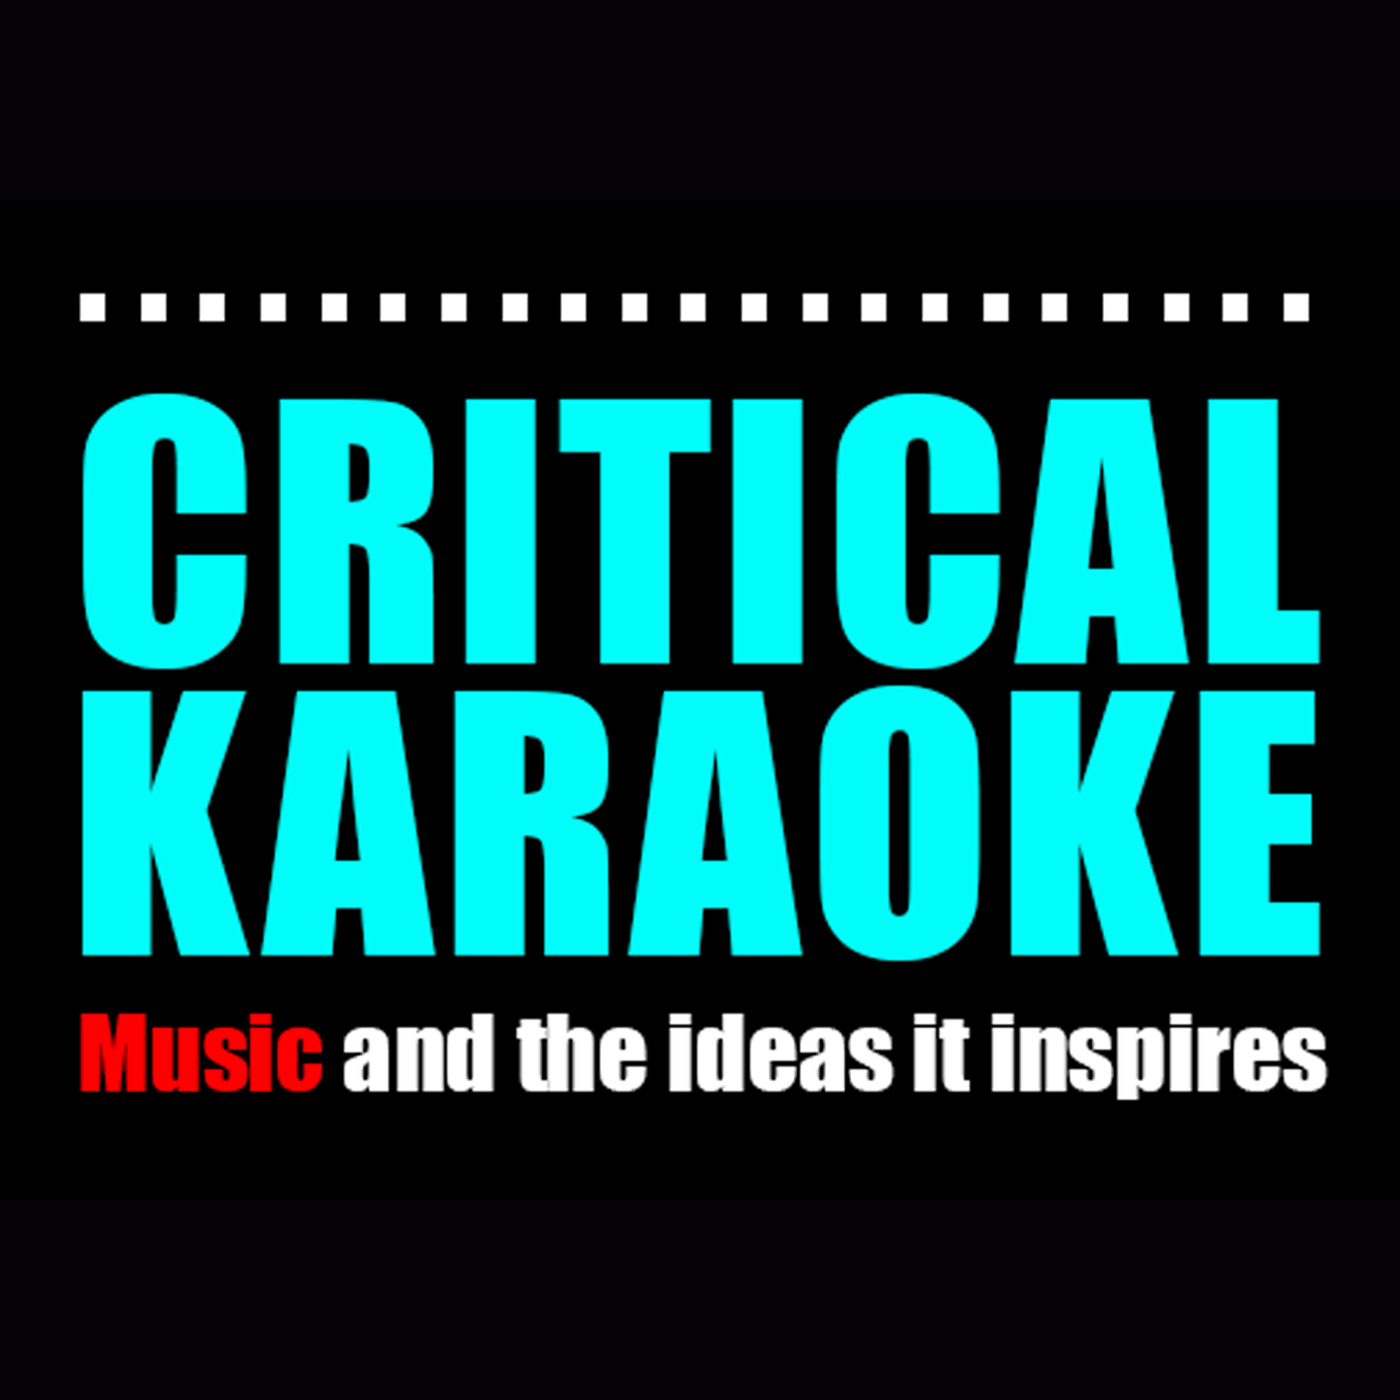 Critical Karaoke